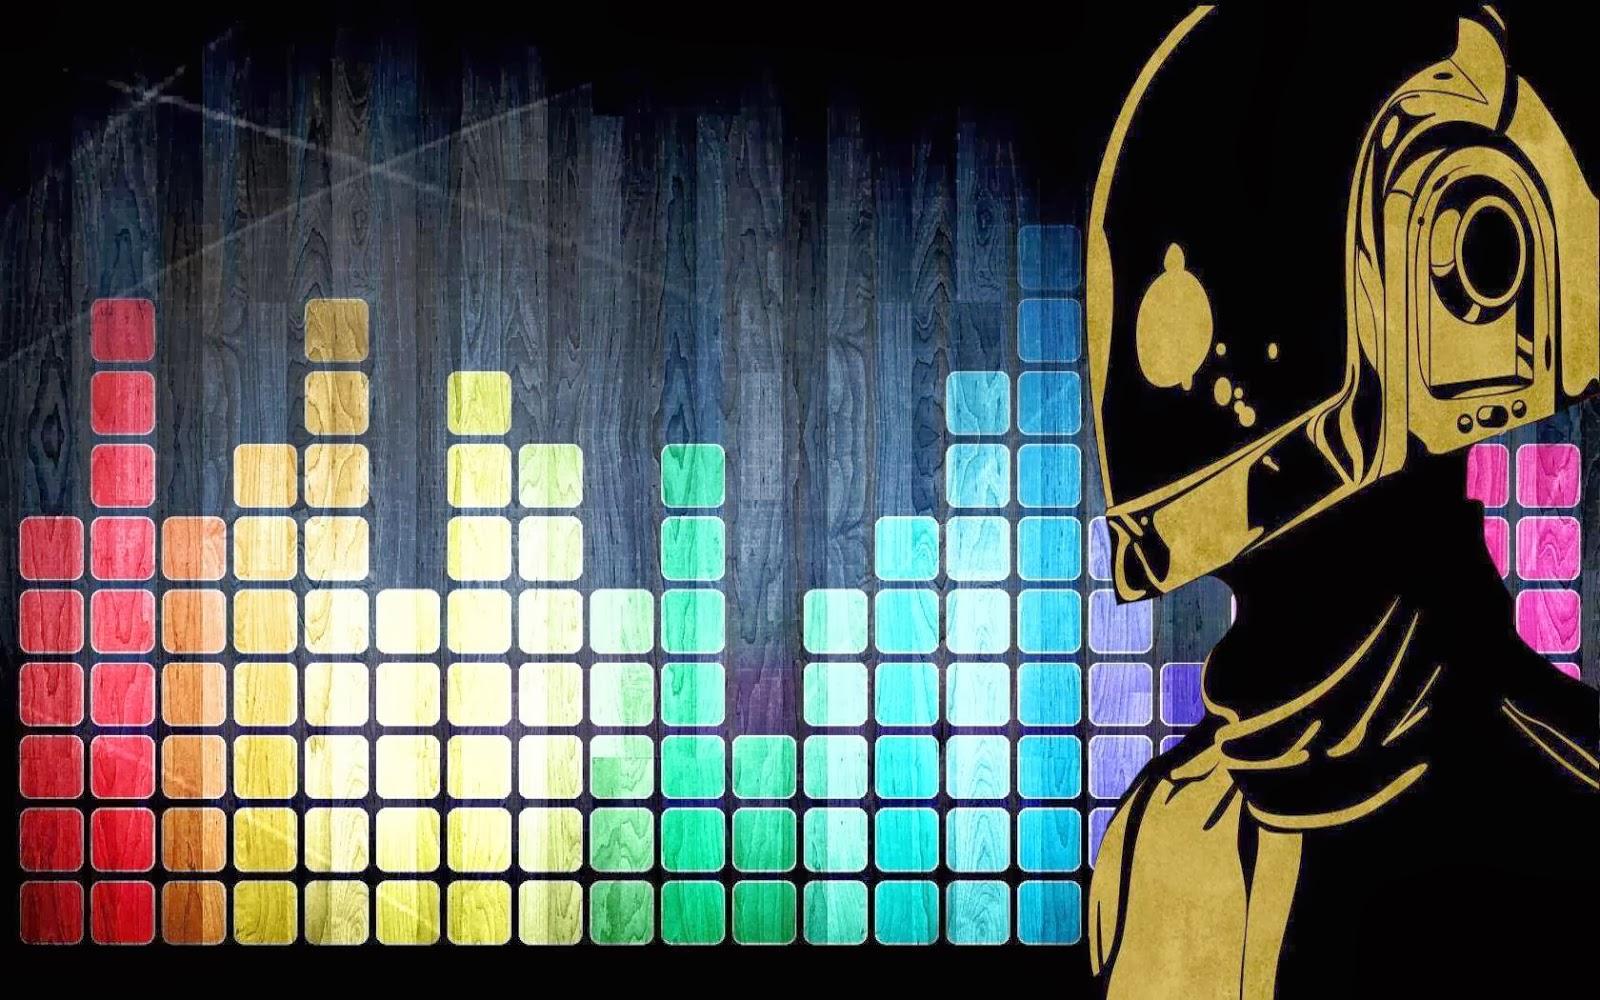 Fondo De Pantalla Abstracto Barras De Colores: Fondo De Pantalla Abstracto Barras Ecualizador Daft Punk